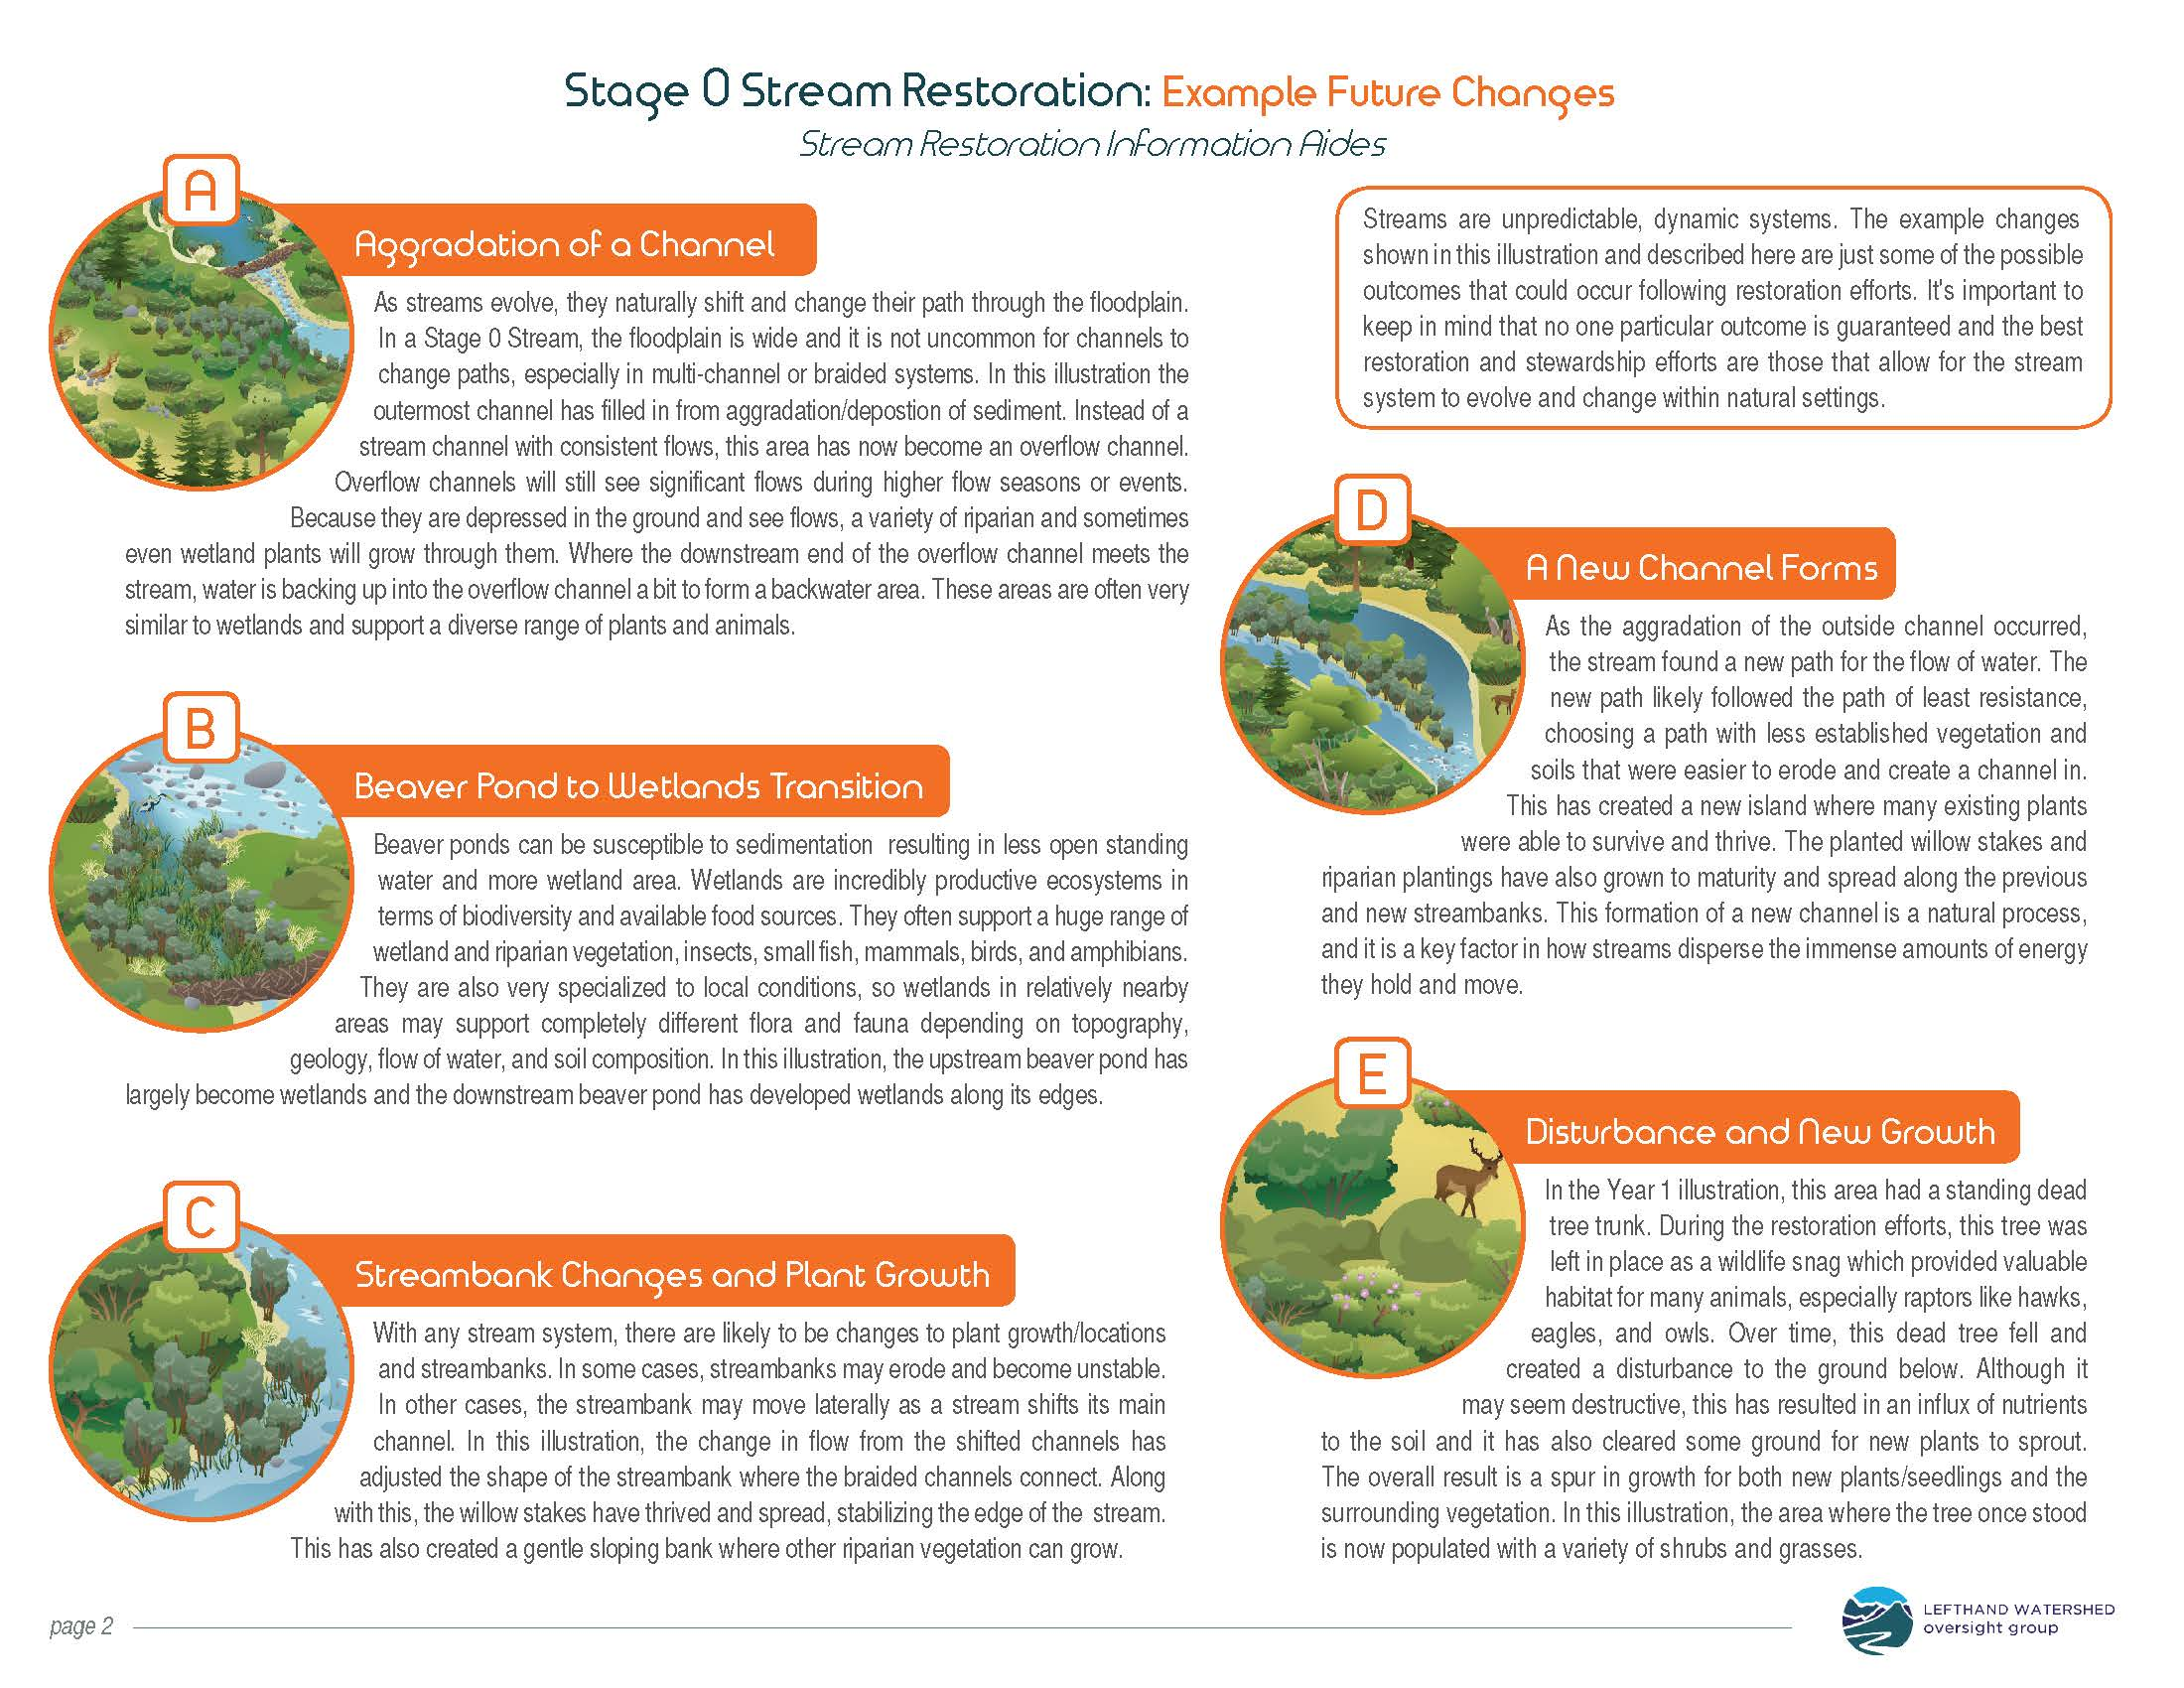 Restoration Possibilities - future conditions (back sheet)